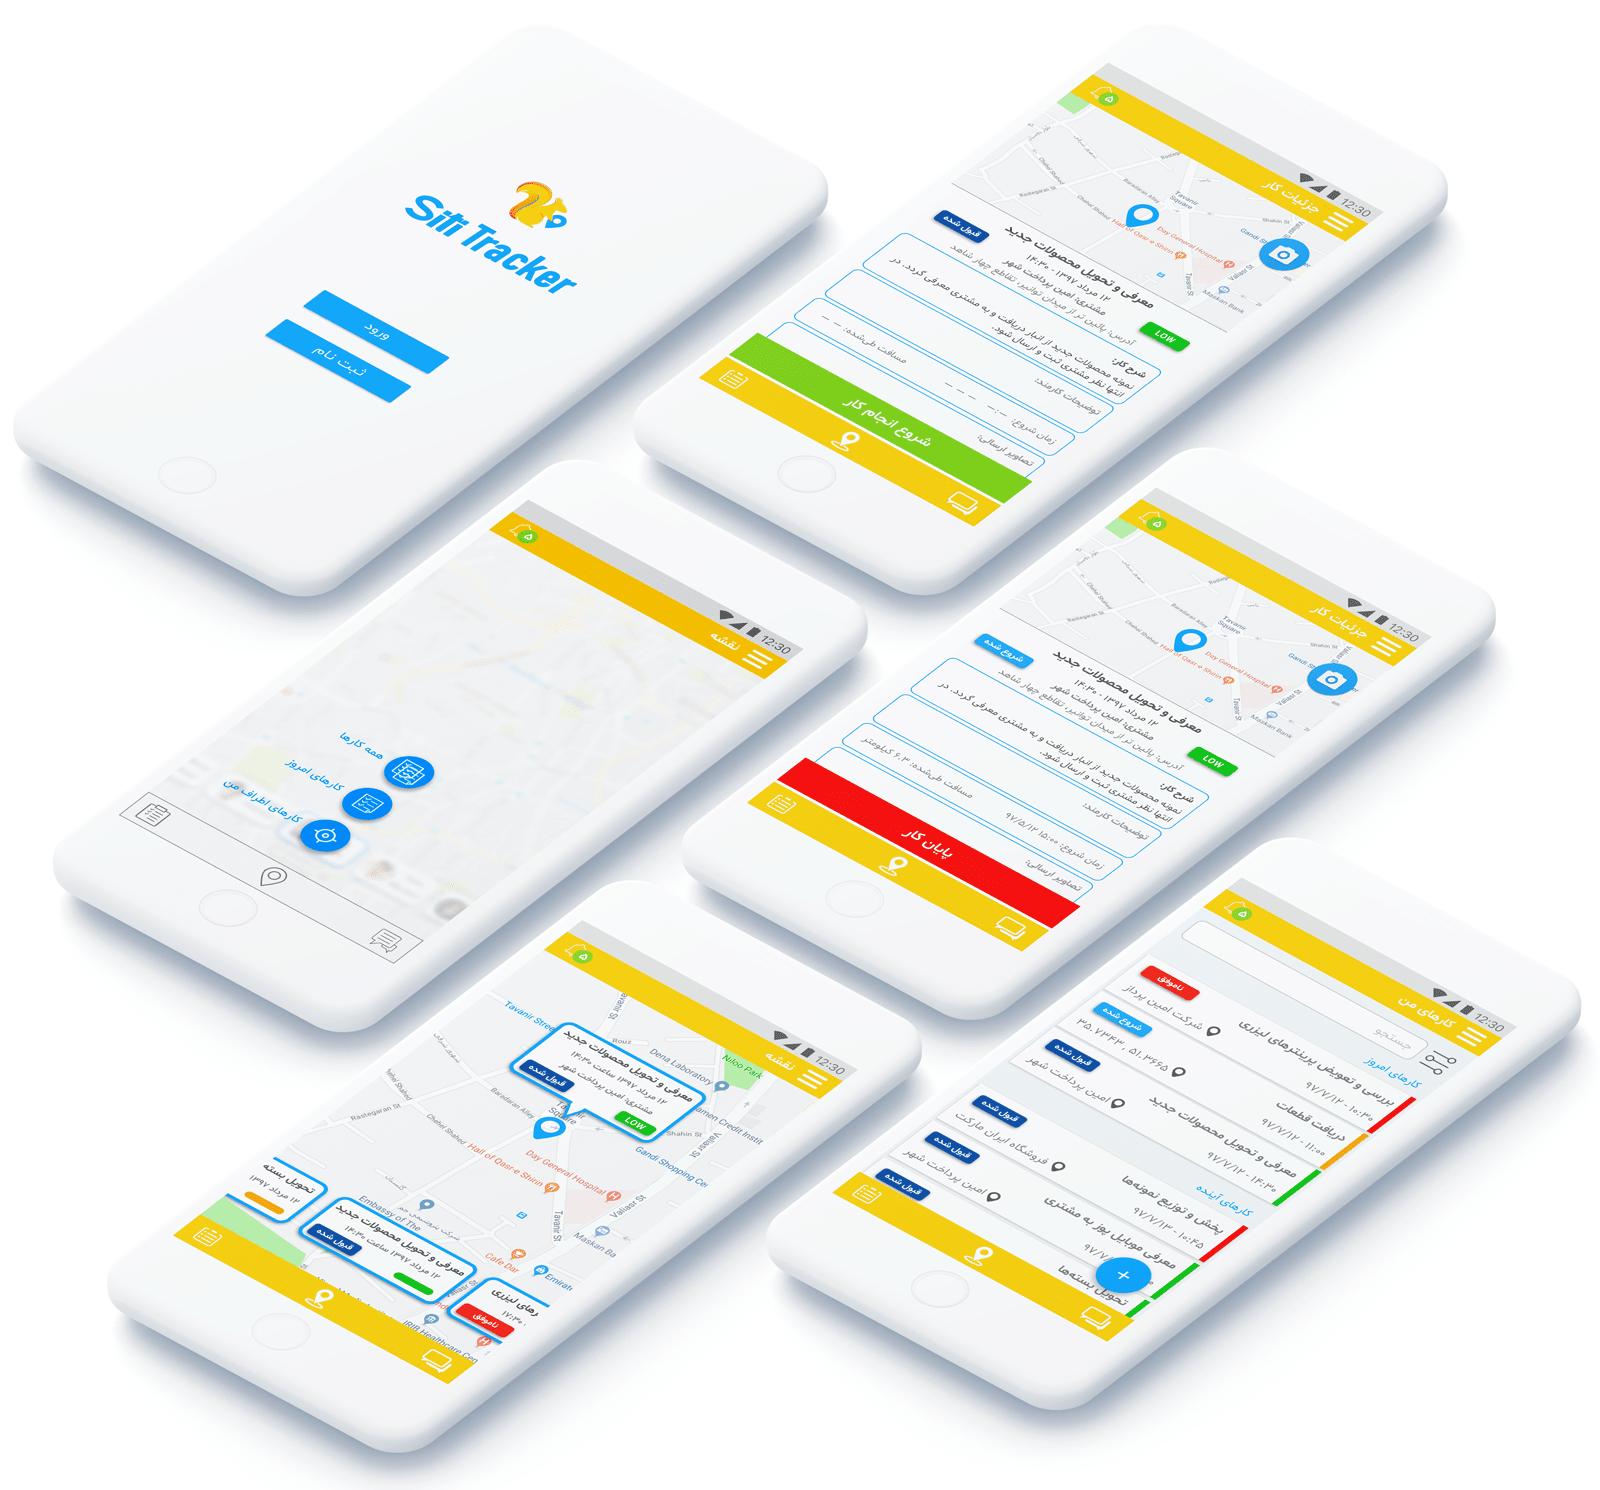 Siti Tracker GPS based Field Service Management